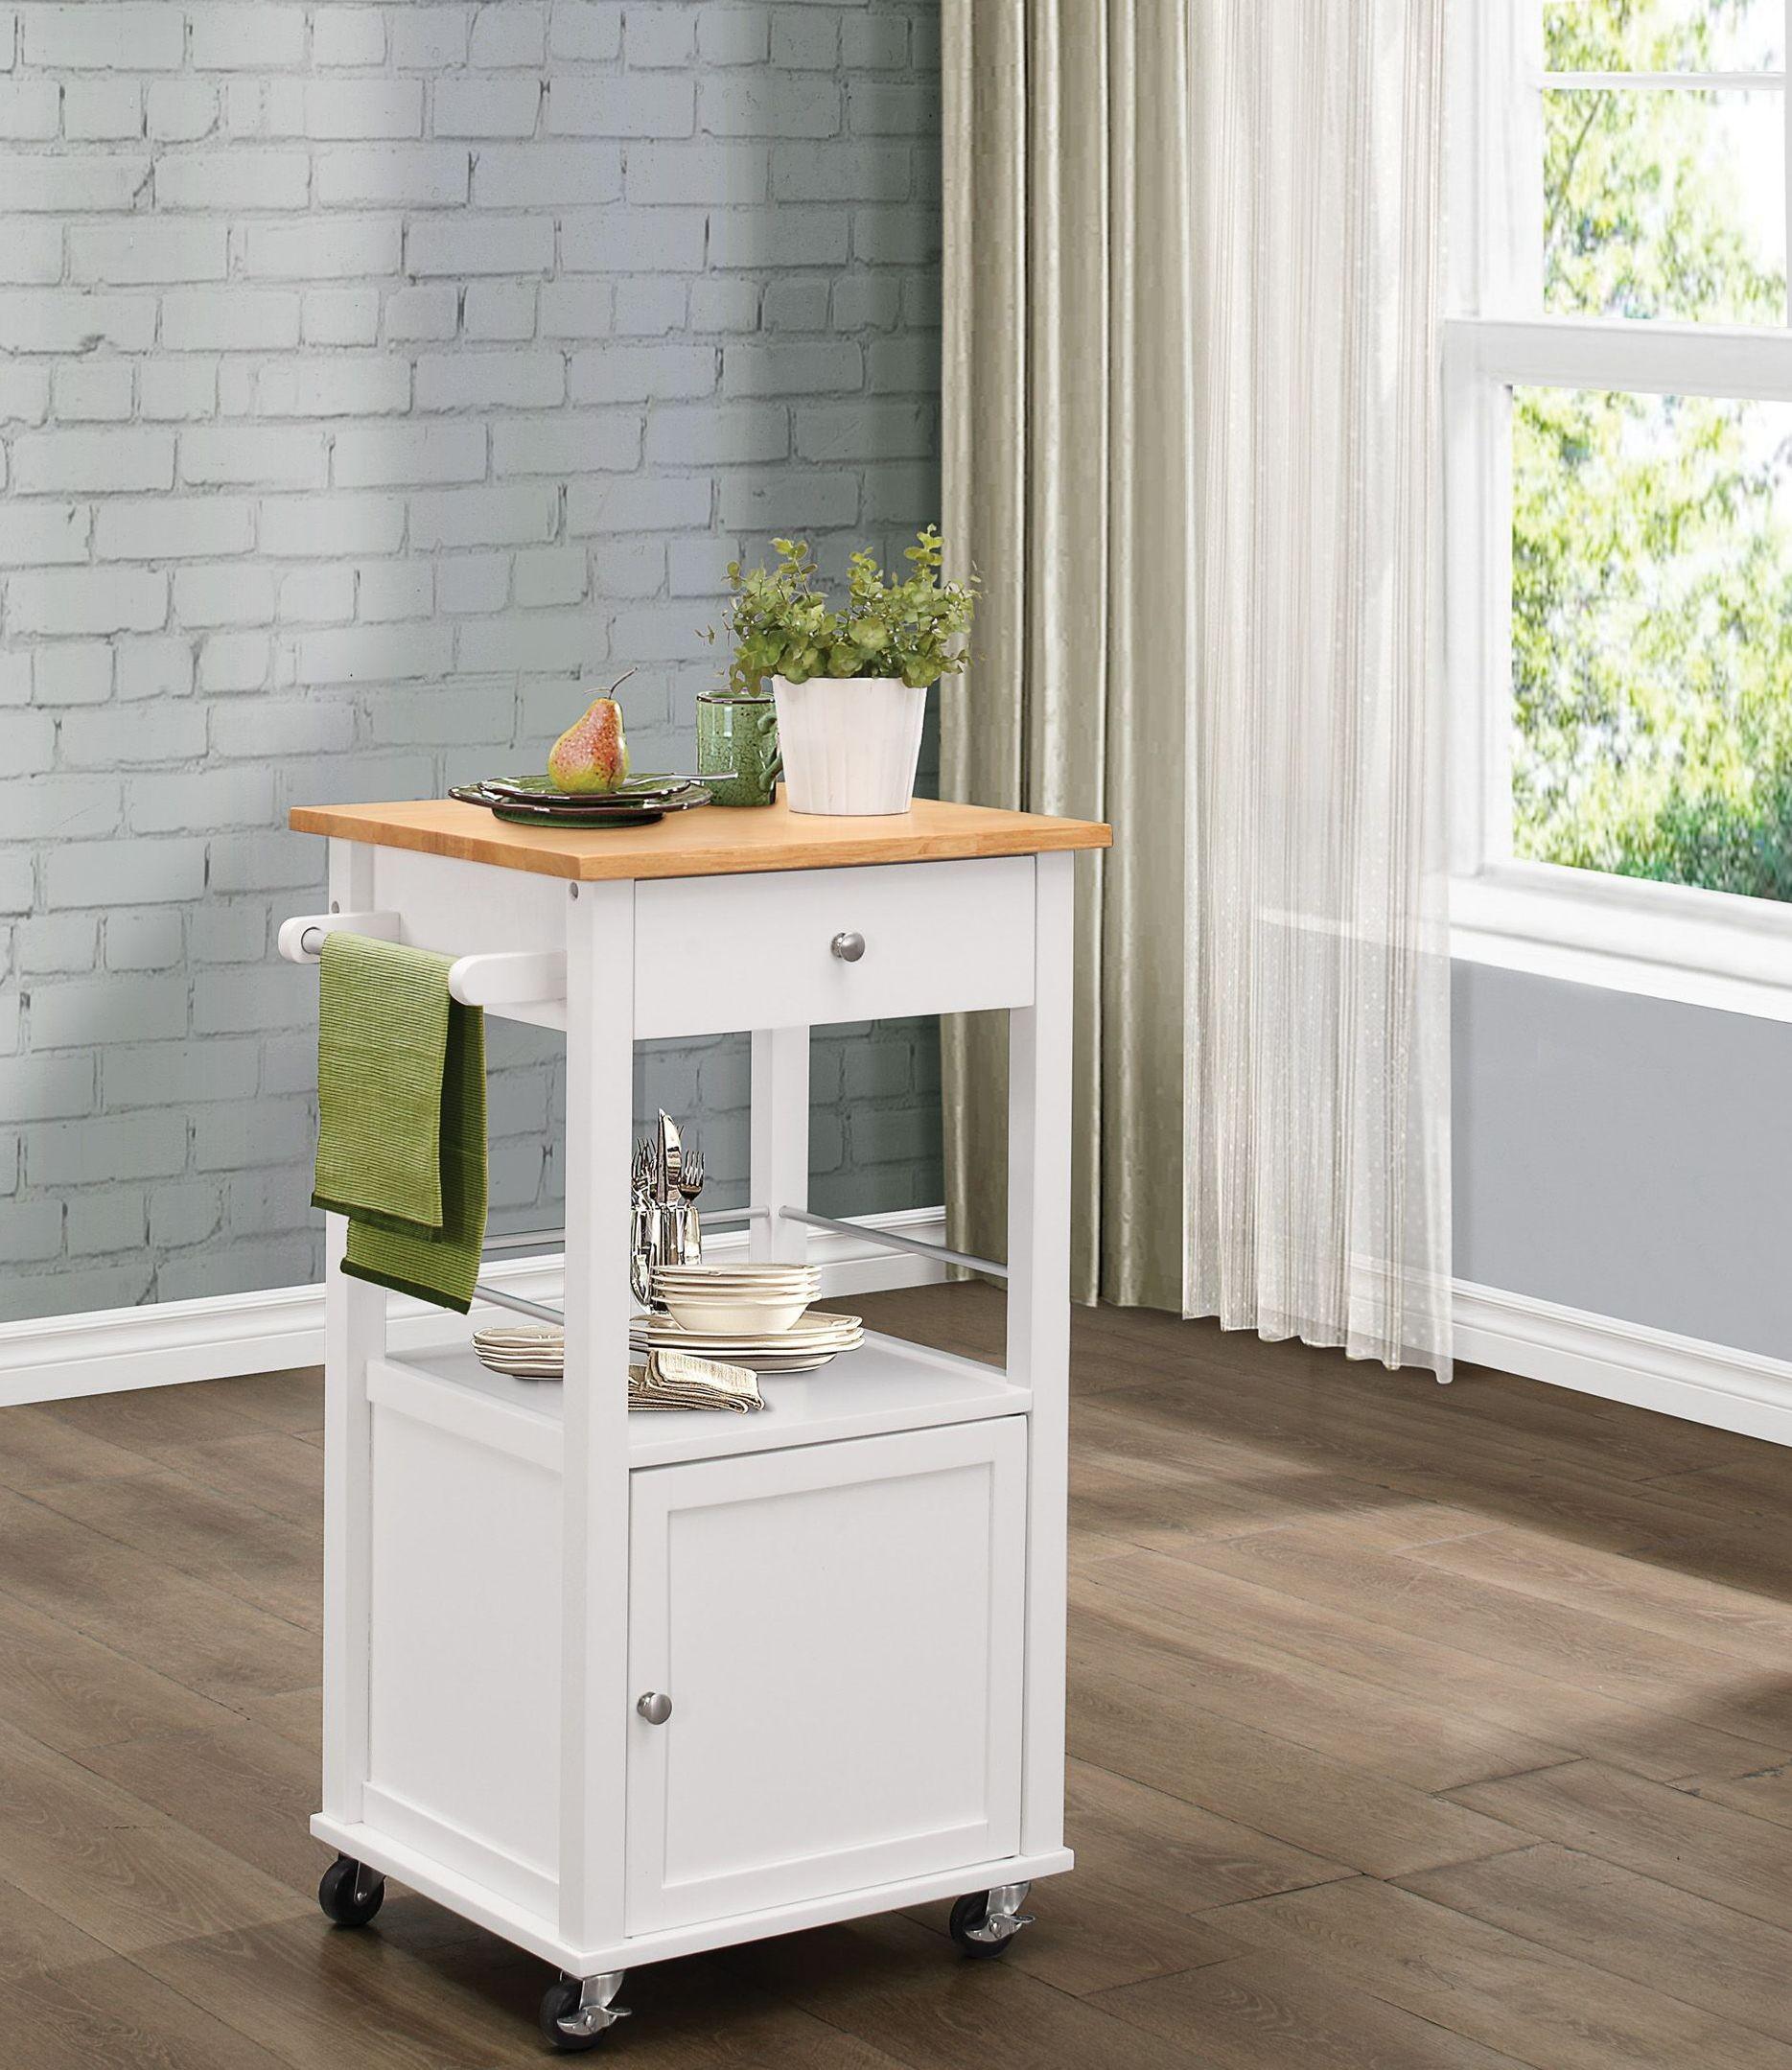 Kady White Kitchen Cart 4695wt 07 Homelegance